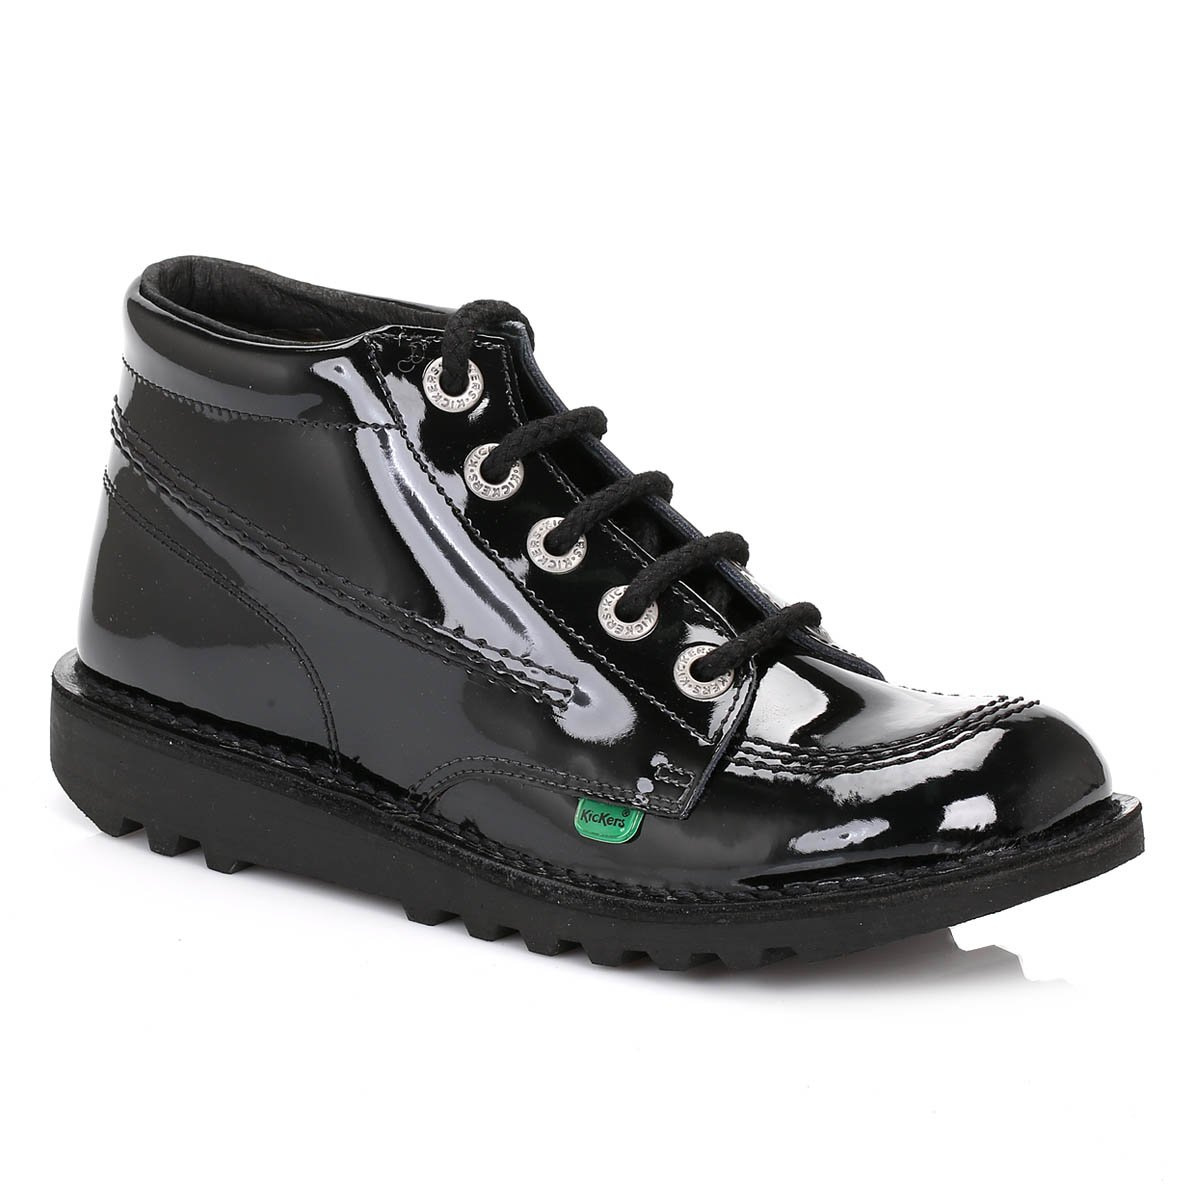 premium selection 5518a 6466f Kickers Boots Genuine Classic Kick Hi Junior Kids Boots Shoes Size UK 3-6  BLACK PATENT  Amazon.co.uk  Shoes   Bags